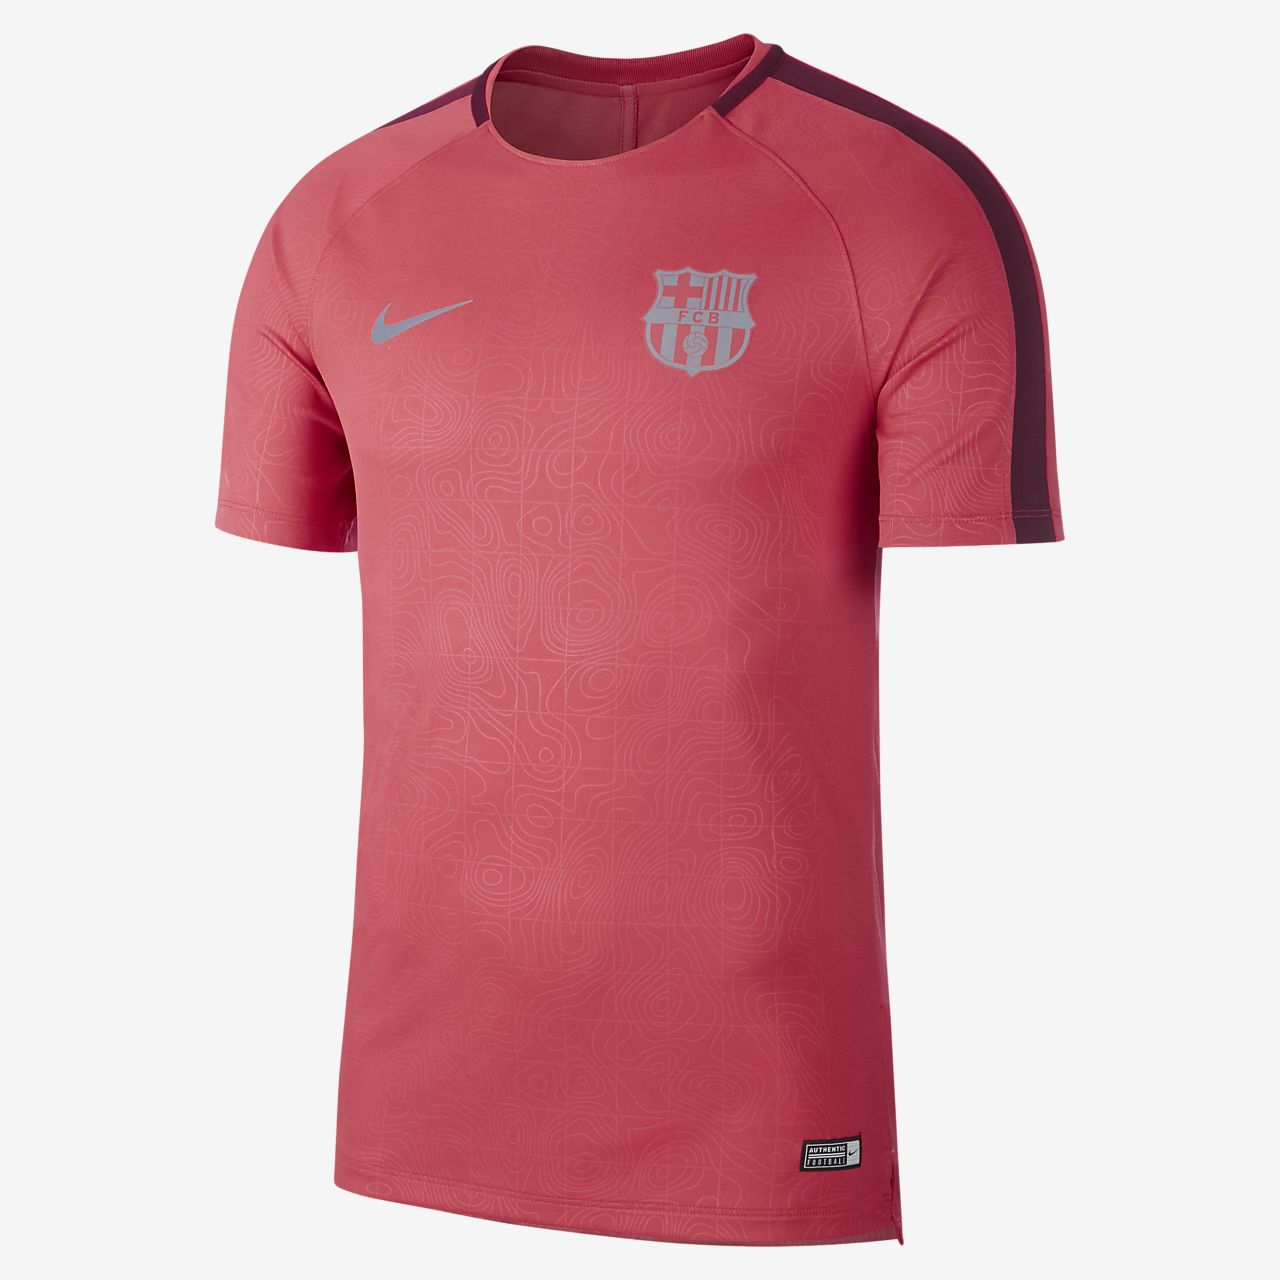 Deslumbrante motor Afectar  FC Barcelona Dri-FIT Squad Men's Short-Sleeve Football Top. Nike BG